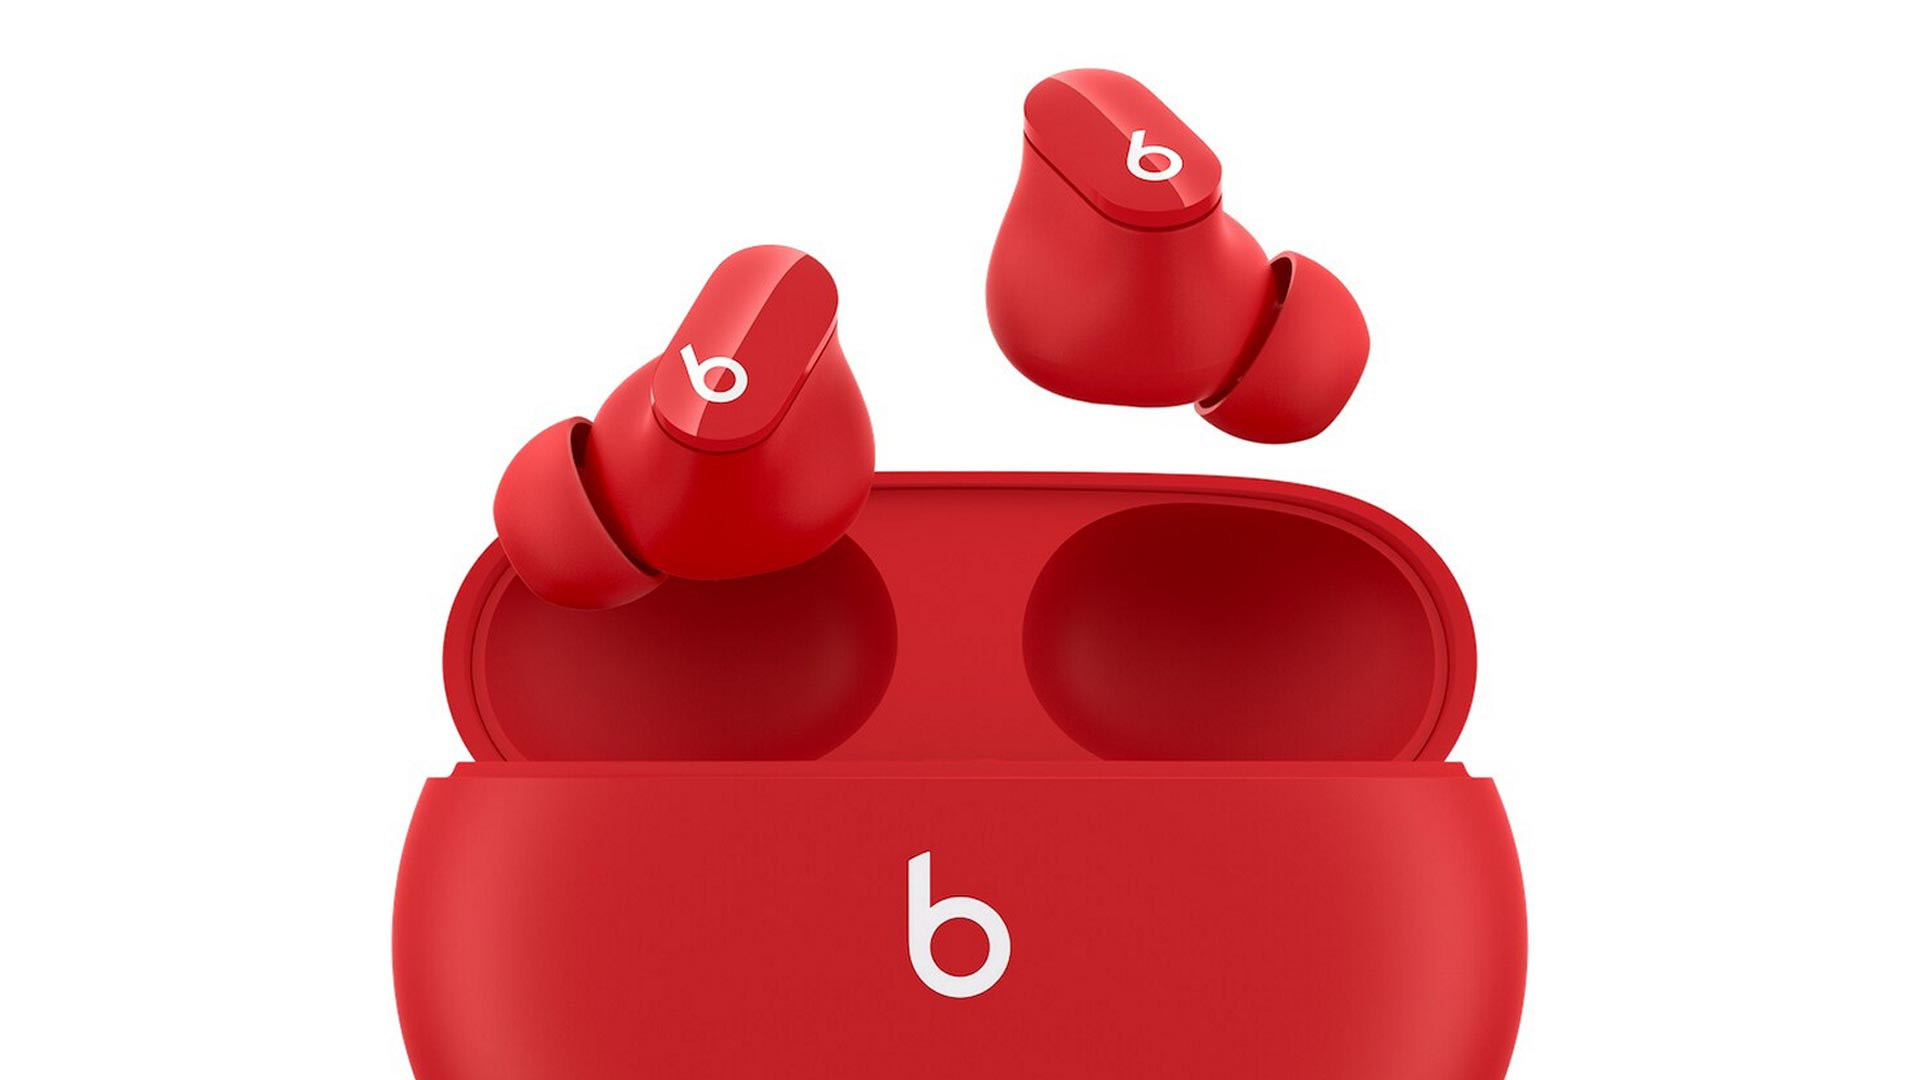 Kopfhörer, Headset, Bluetooth, Drahtlos, Wireless, kabellos, Ohrhörer, USB Type-C, Bluetooth-Kopfhörer, Earbuds, In-Ear-Kopfhörer, Beats, Truly Wireless, In-Ear, Studio, Wireless Headset, Buds, Apple Beats Studio Buds